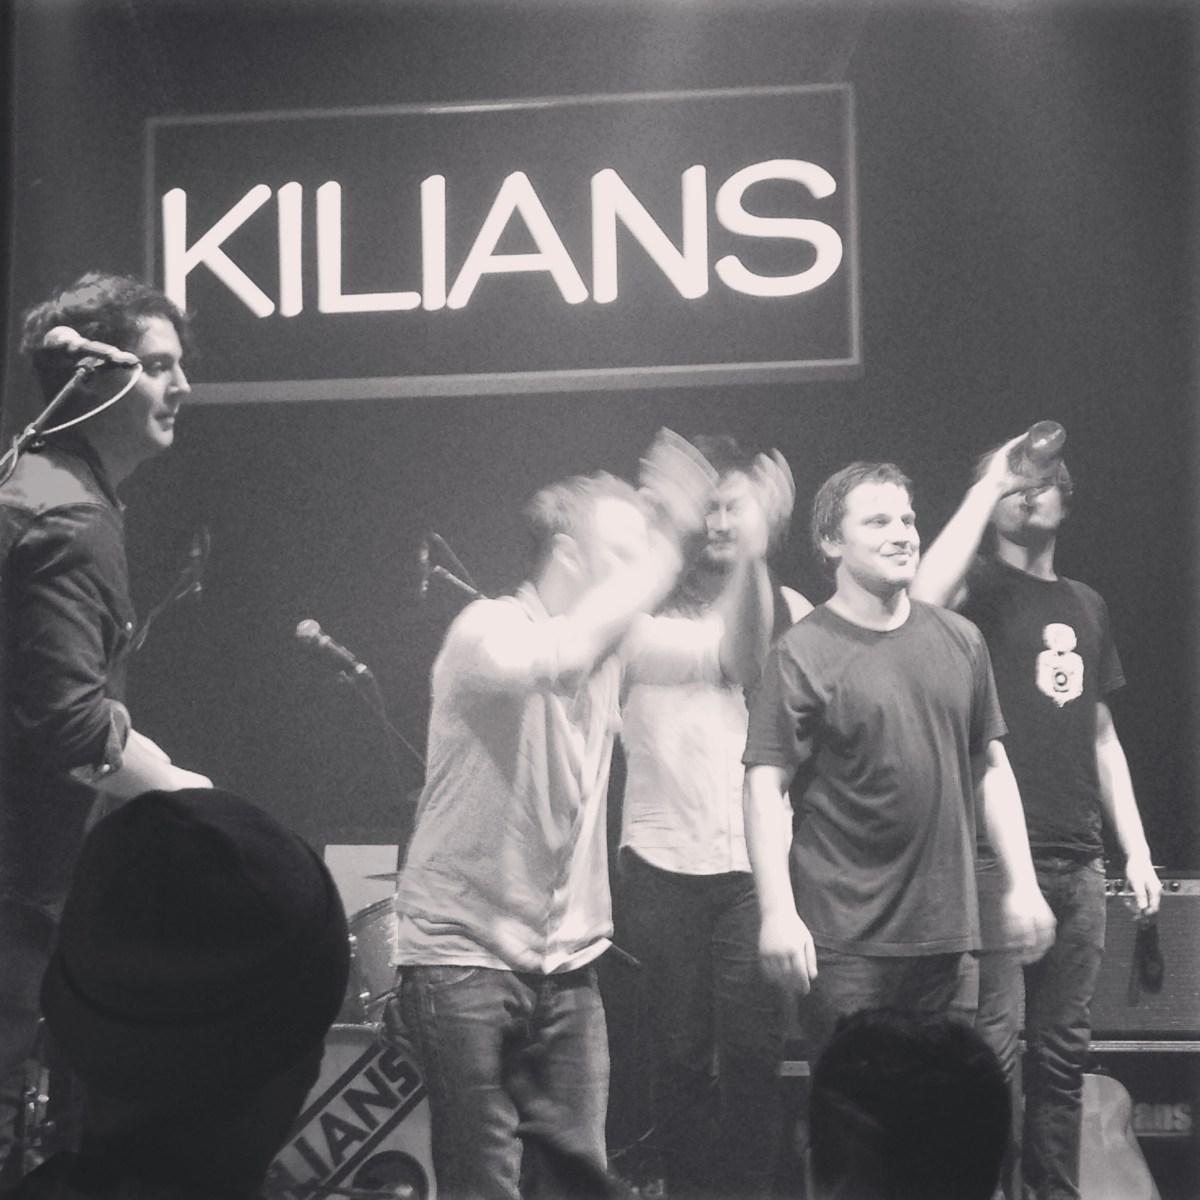 Kilians Live